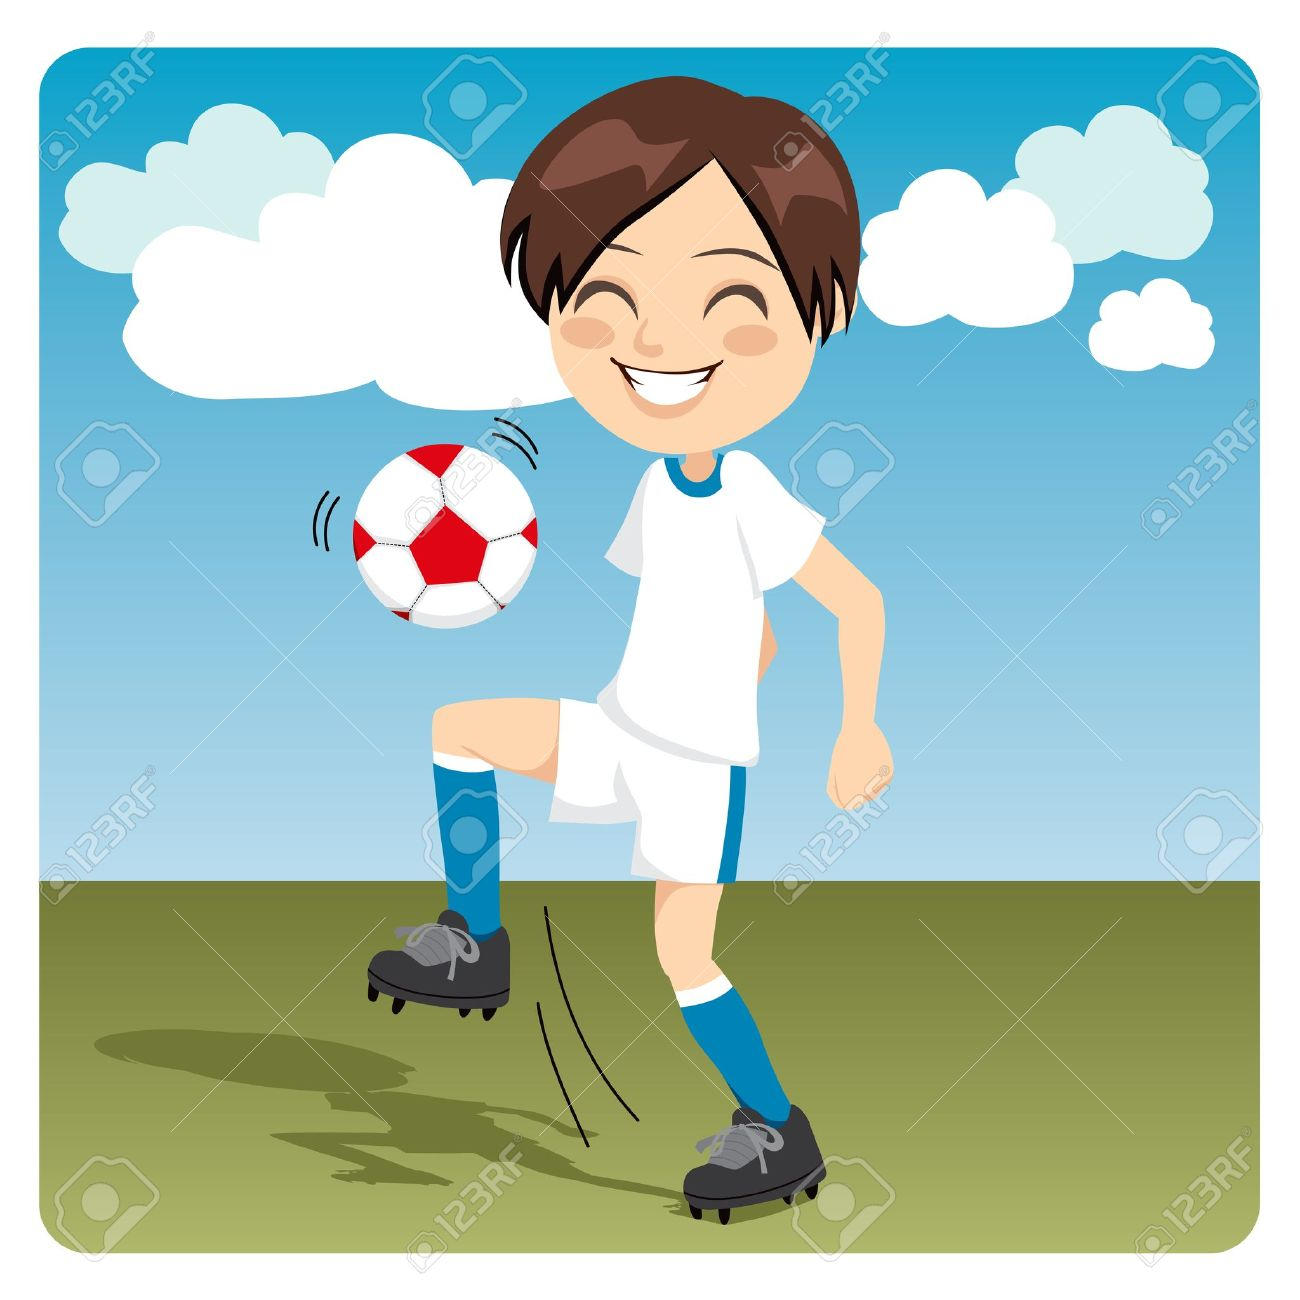 Kid Practicing Soccer Knee Kicks On The Field Royalty Free.